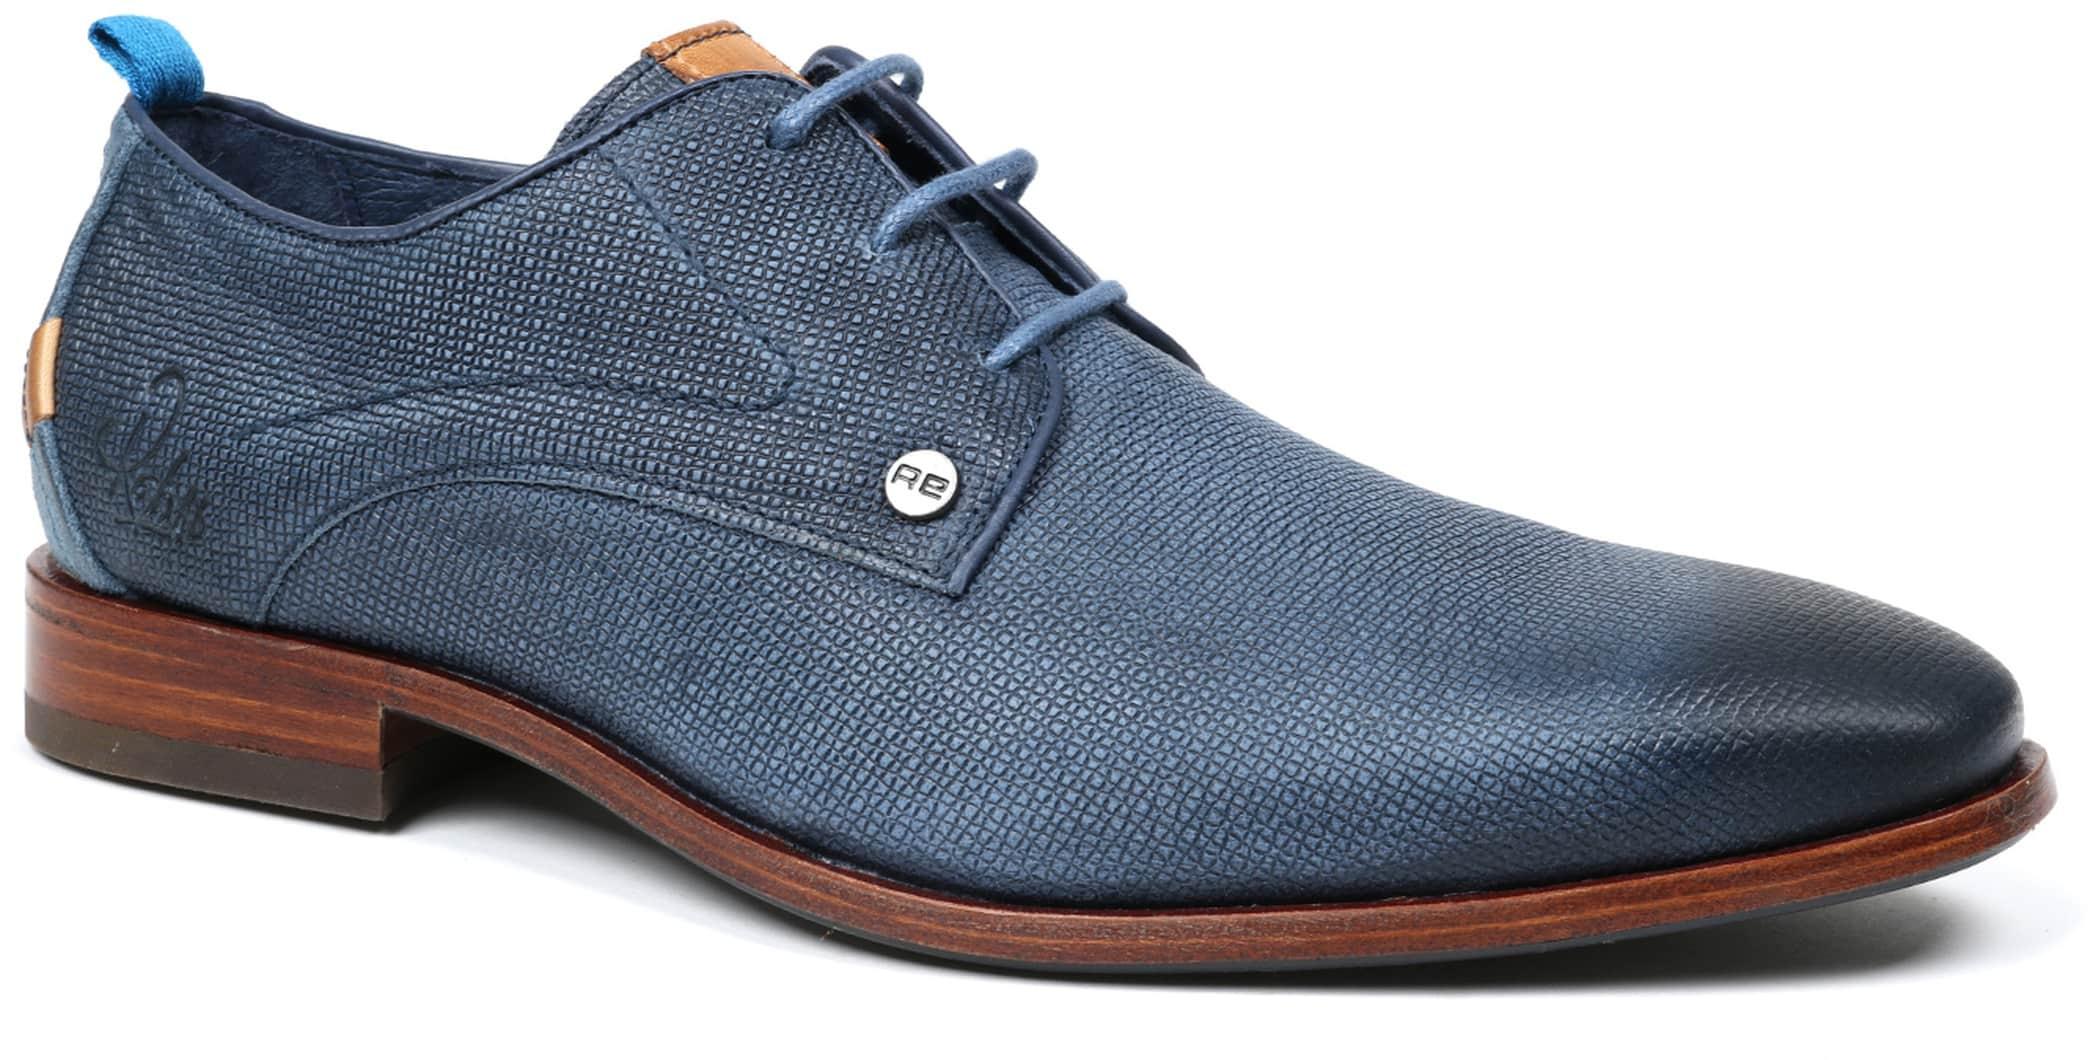 Chaussures Hommes Rehab Mur Gris Greg Vxs6R